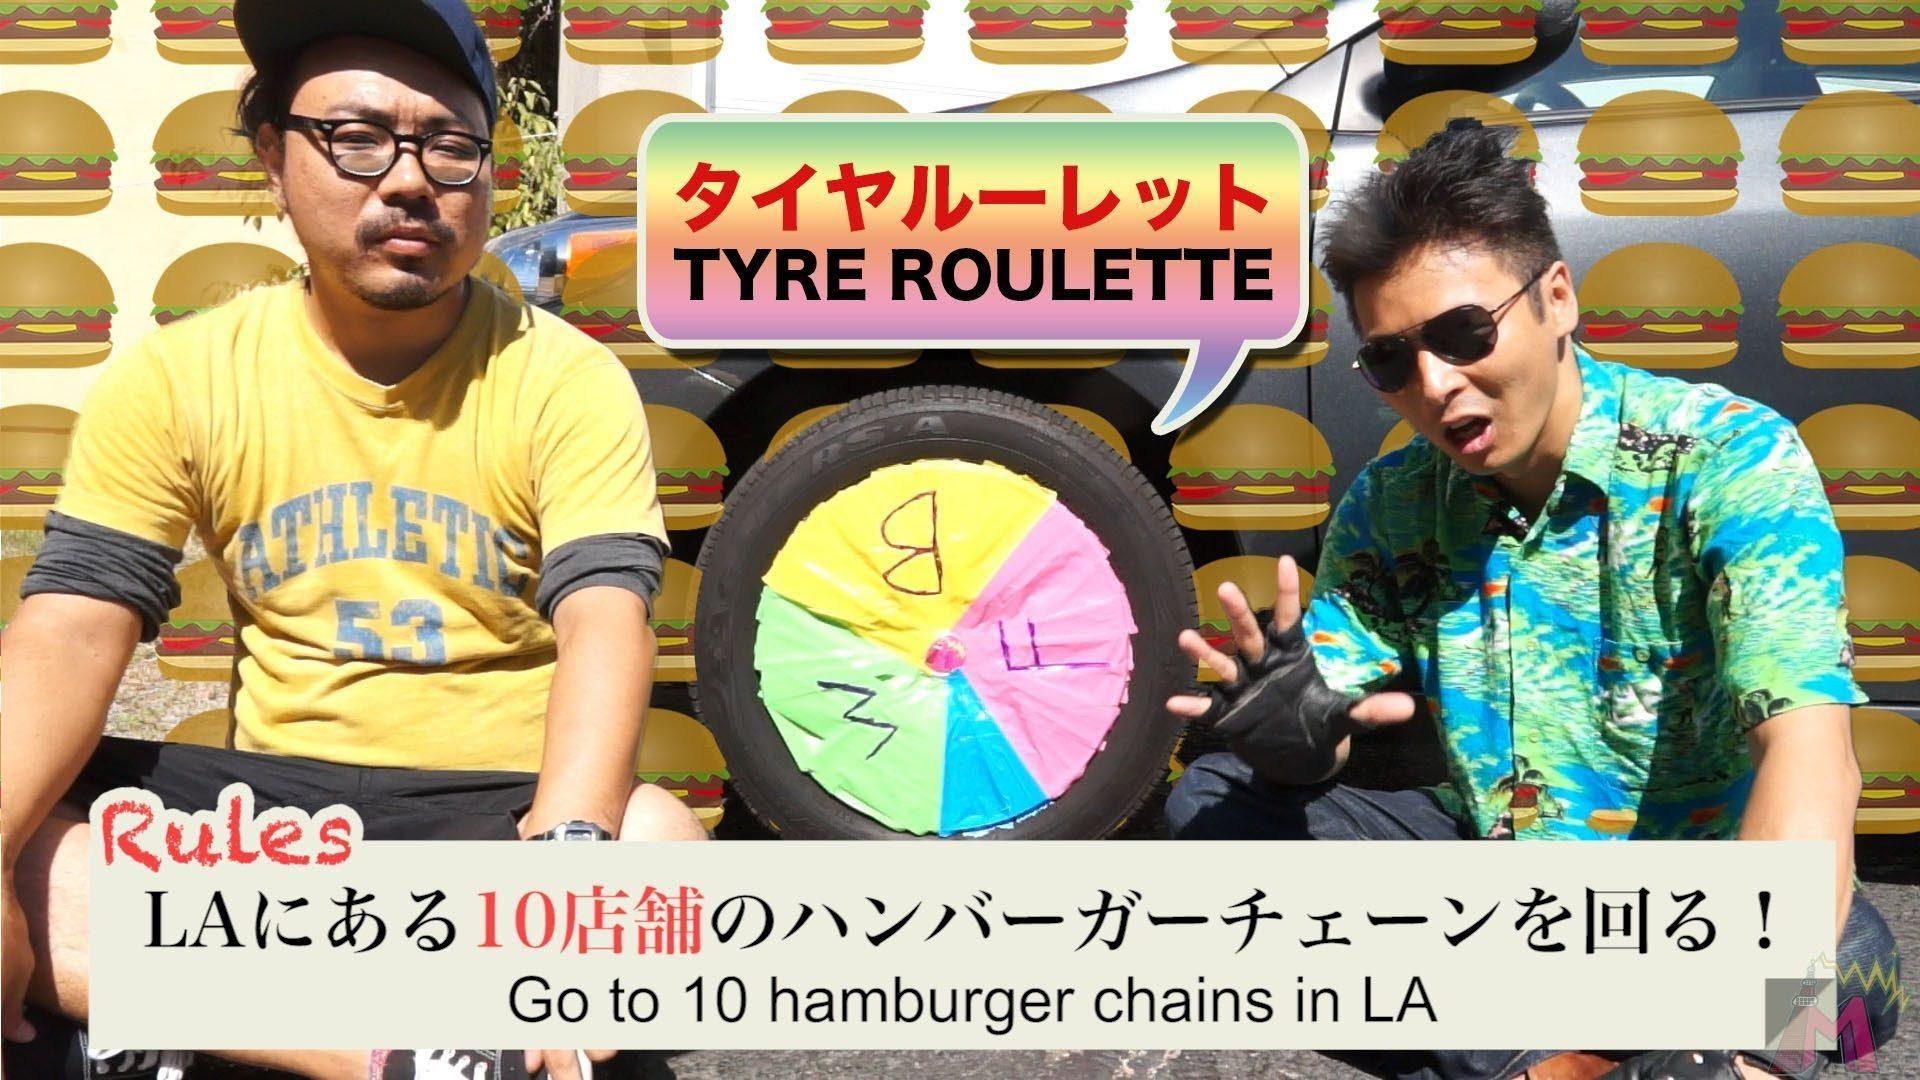 3 Japanese Guys, All 10 American Hamburger Chains